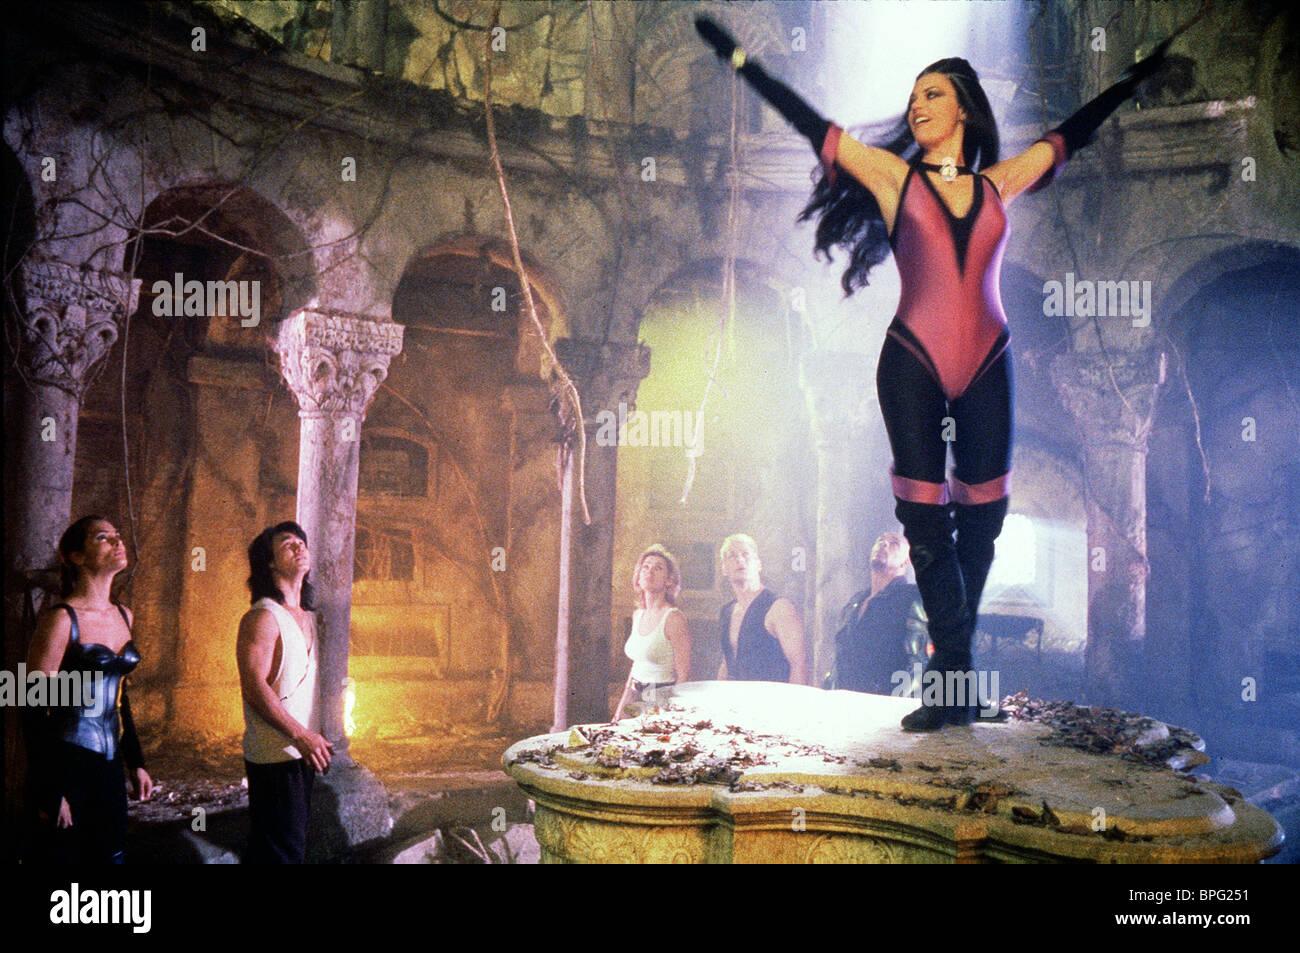 Talisa Soto Robin Shou Musetta Vander Mortal Kombat 2 Stock